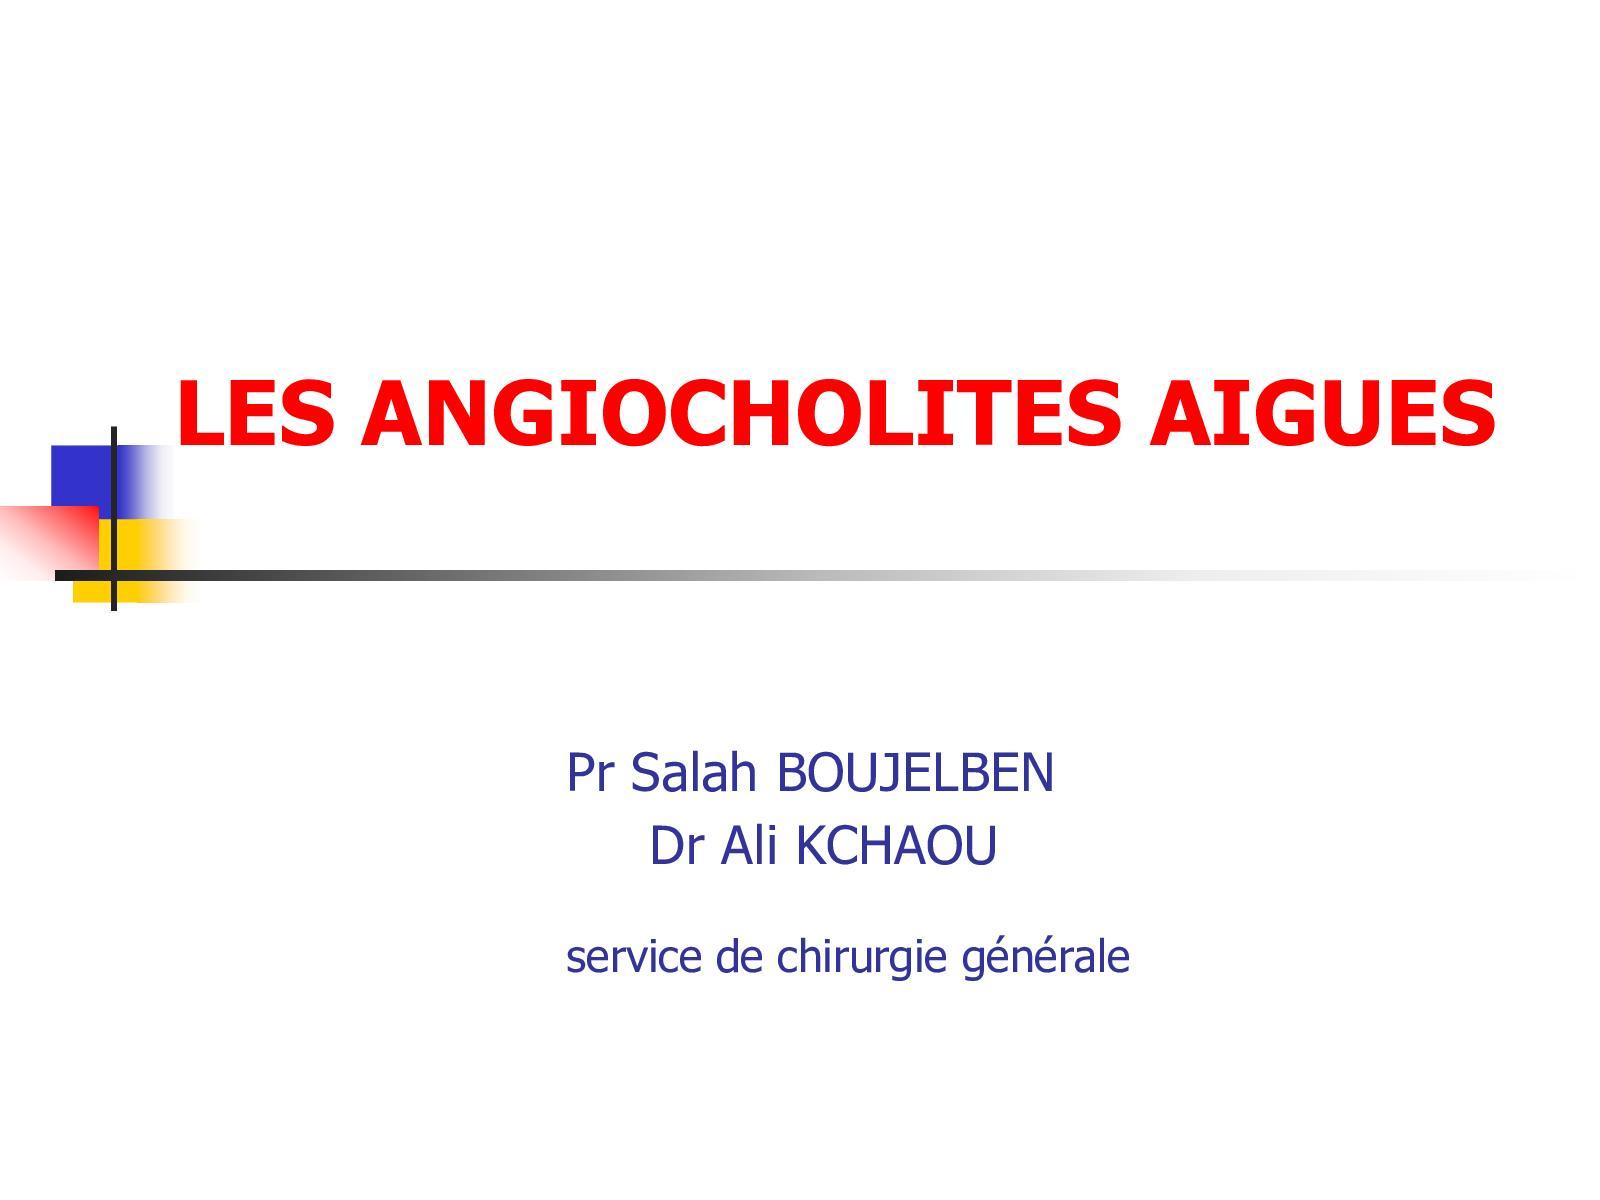 Les Angiocholites Aigues